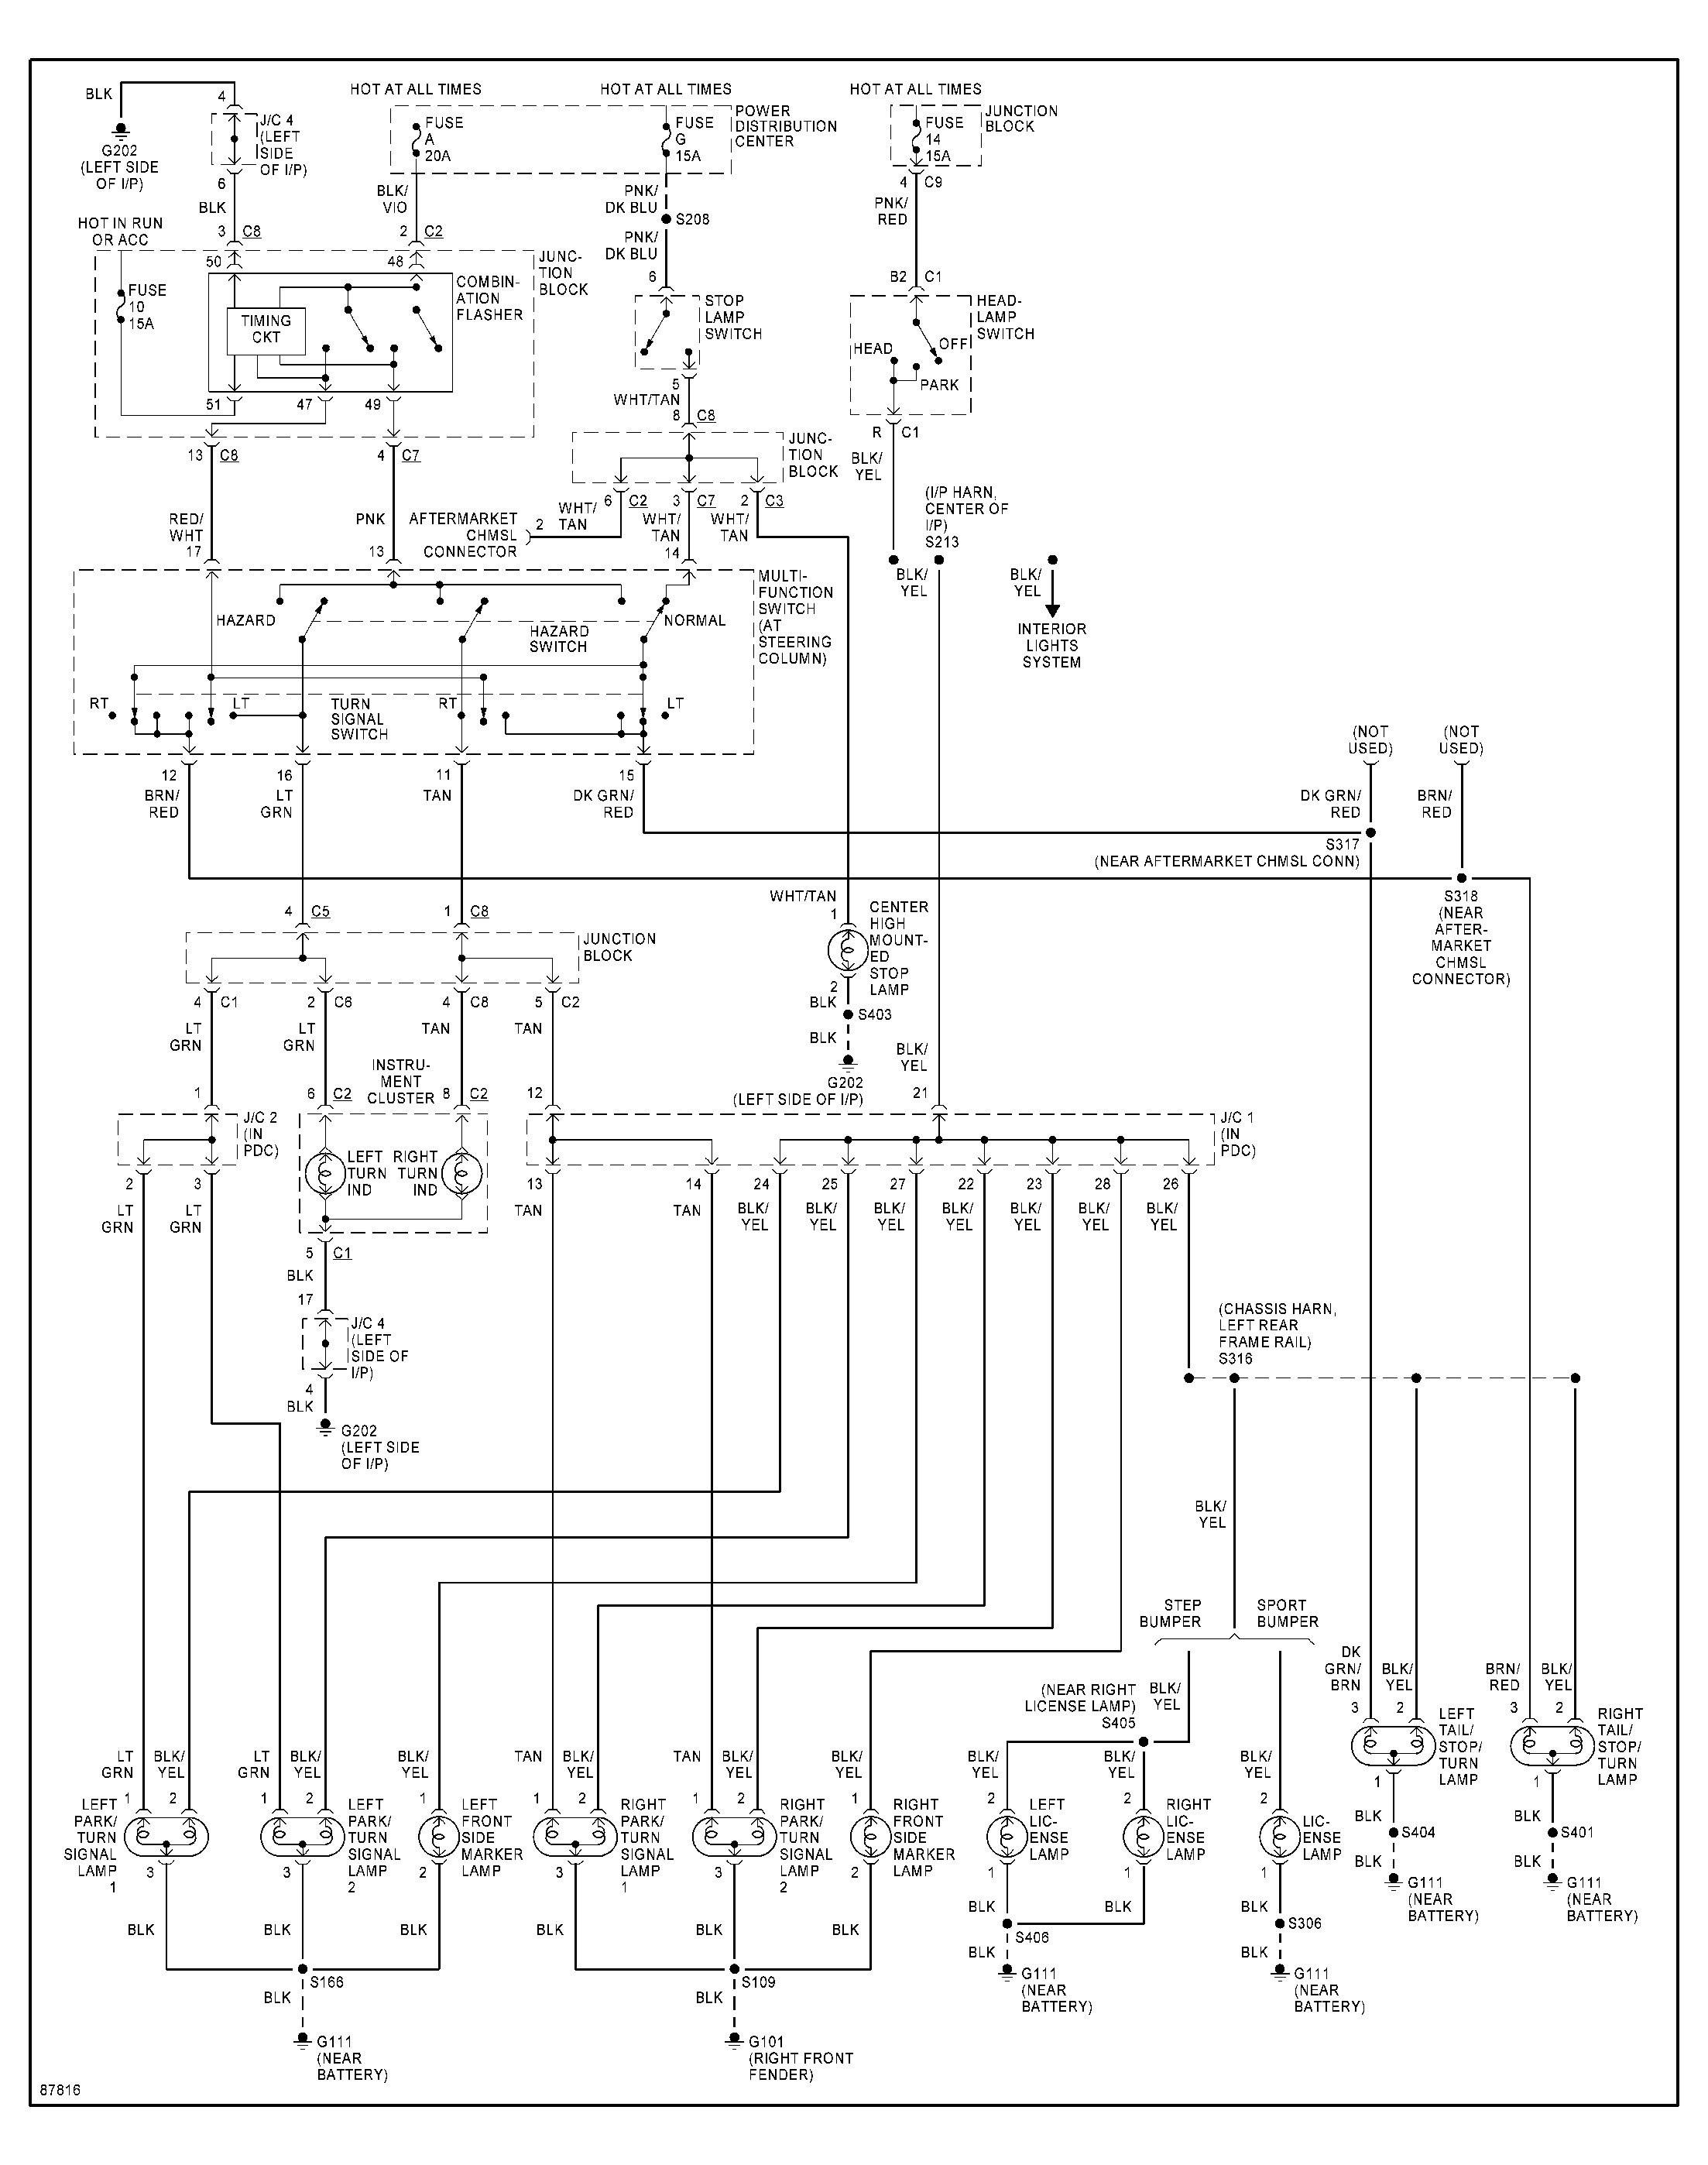 1999 Dodge Dakota Engine Diagram 2002 Dodge Durango Engine Diagram Worksheet and Wiring Diagram • Of 1999 Dodge Dakota Engine Diagram